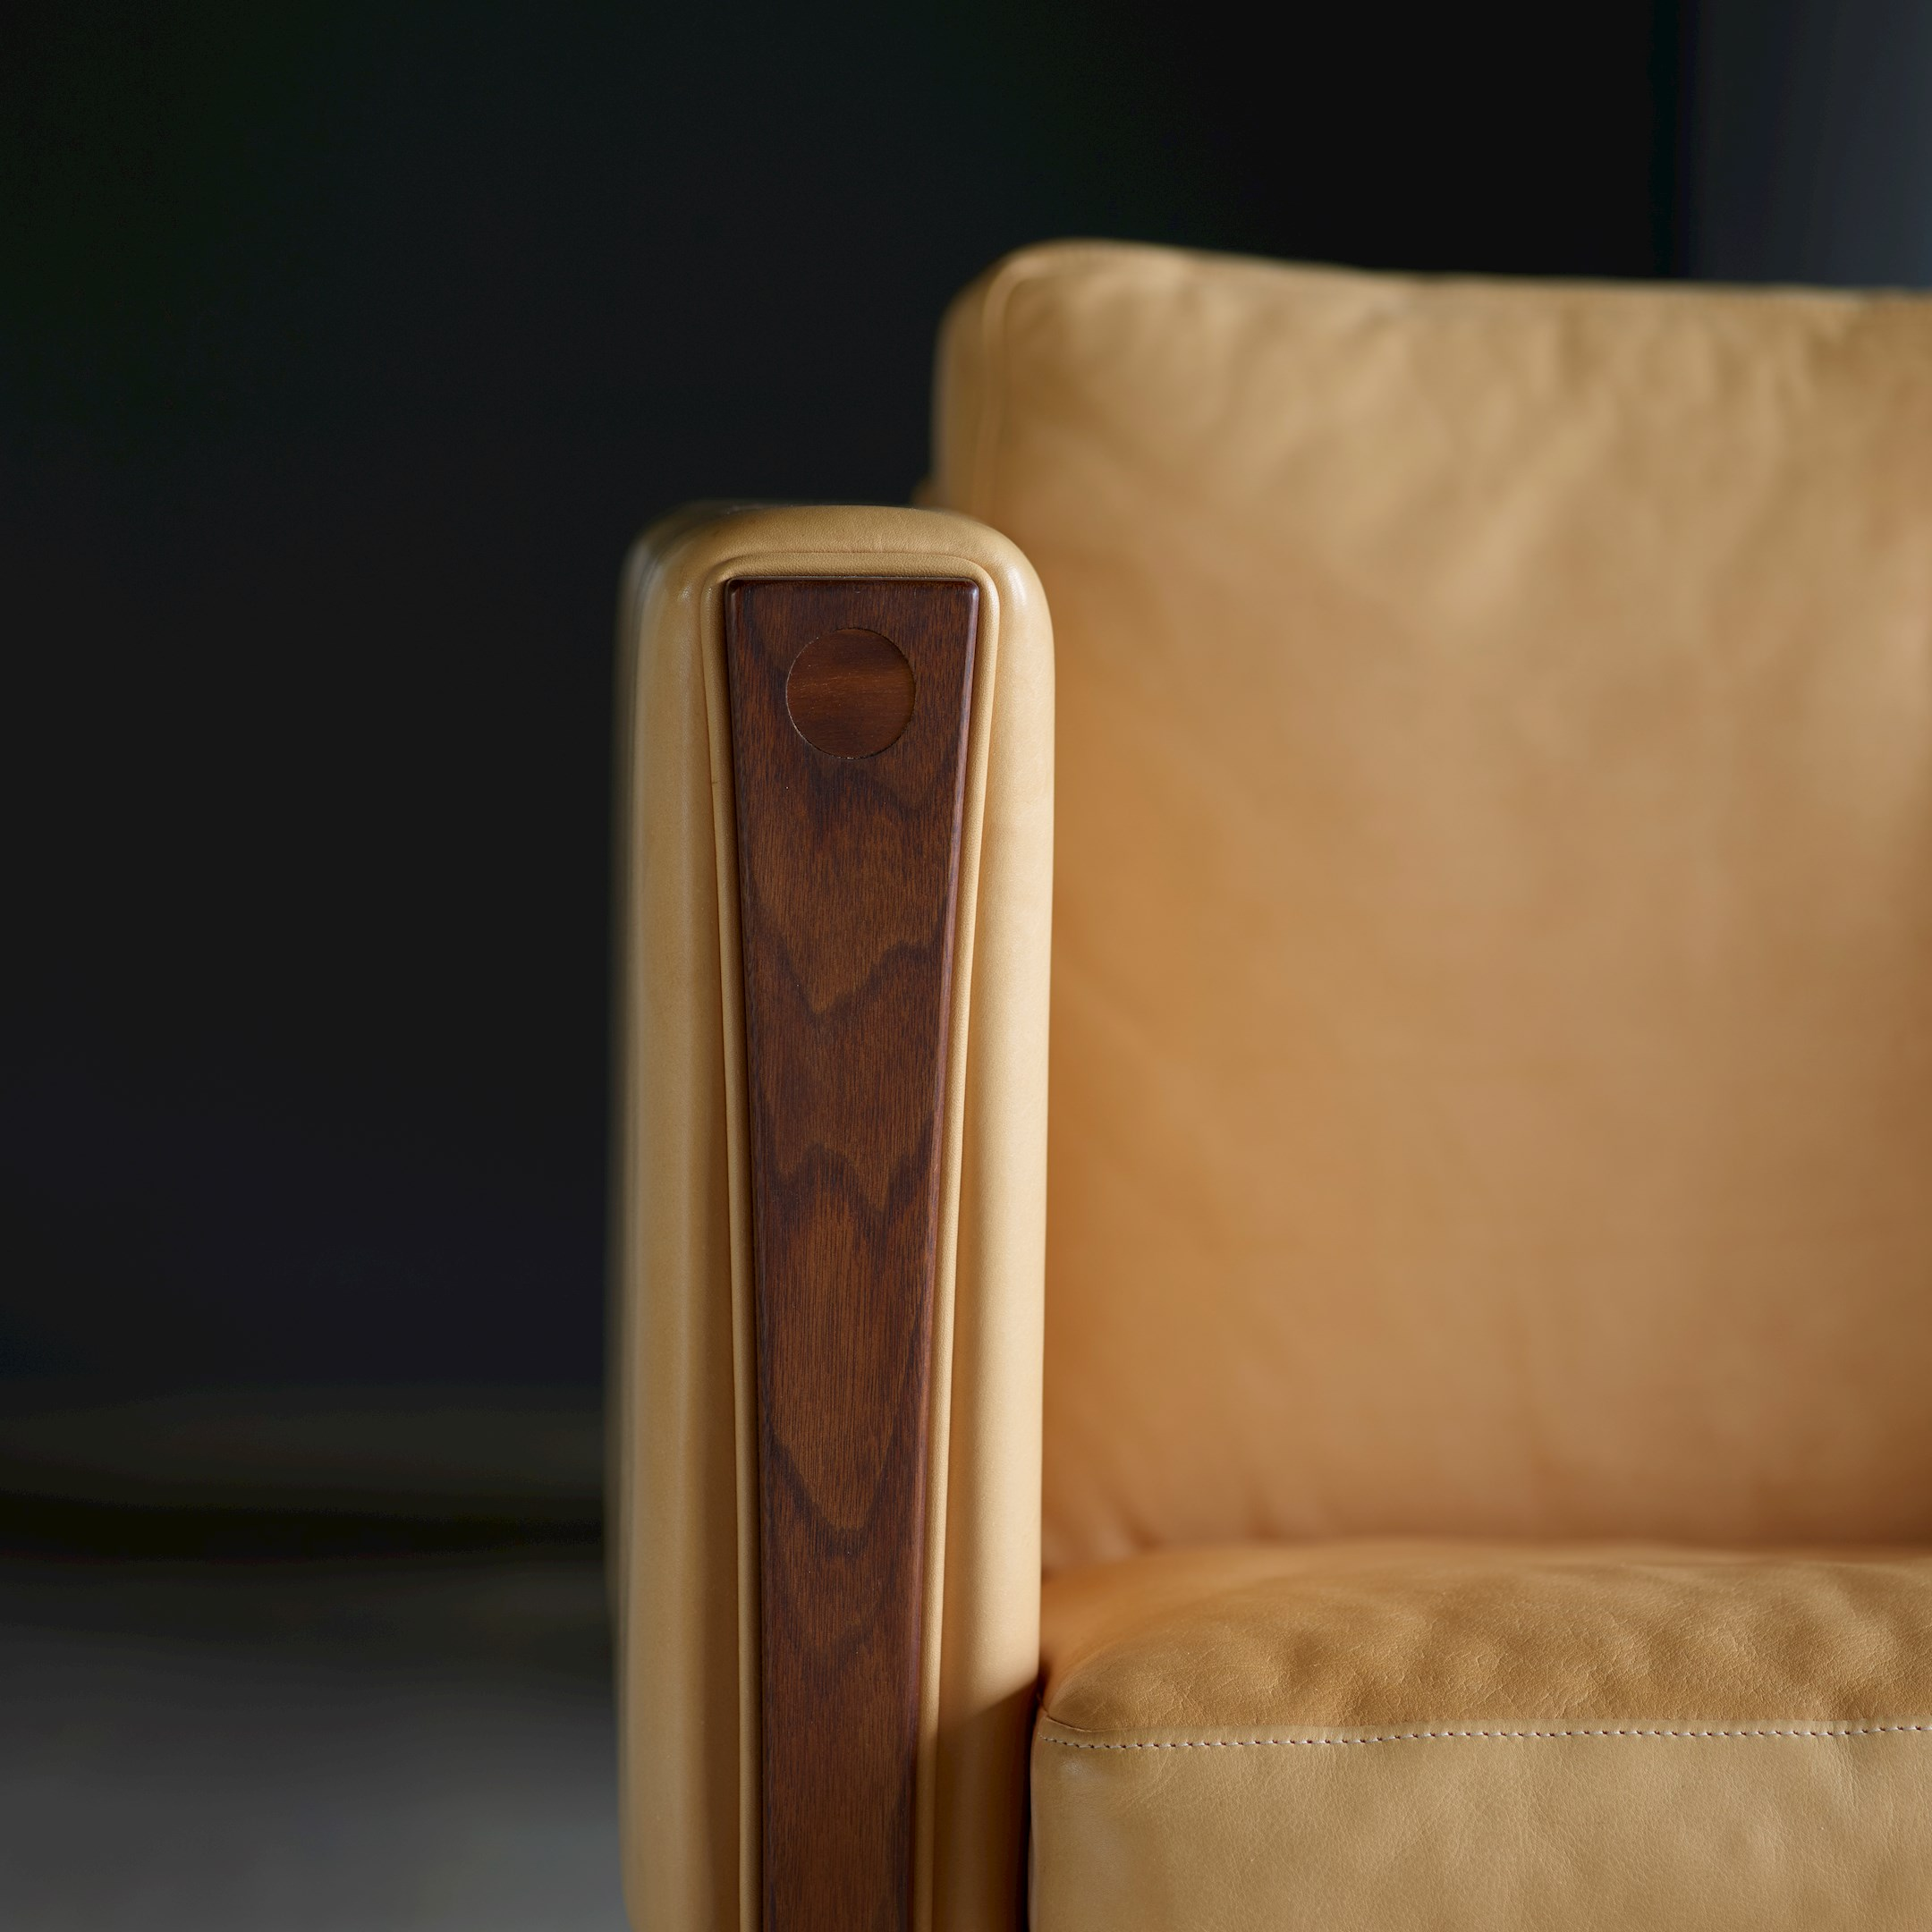 An Unique Partnership: Hans J. Wegner, The Furniture and